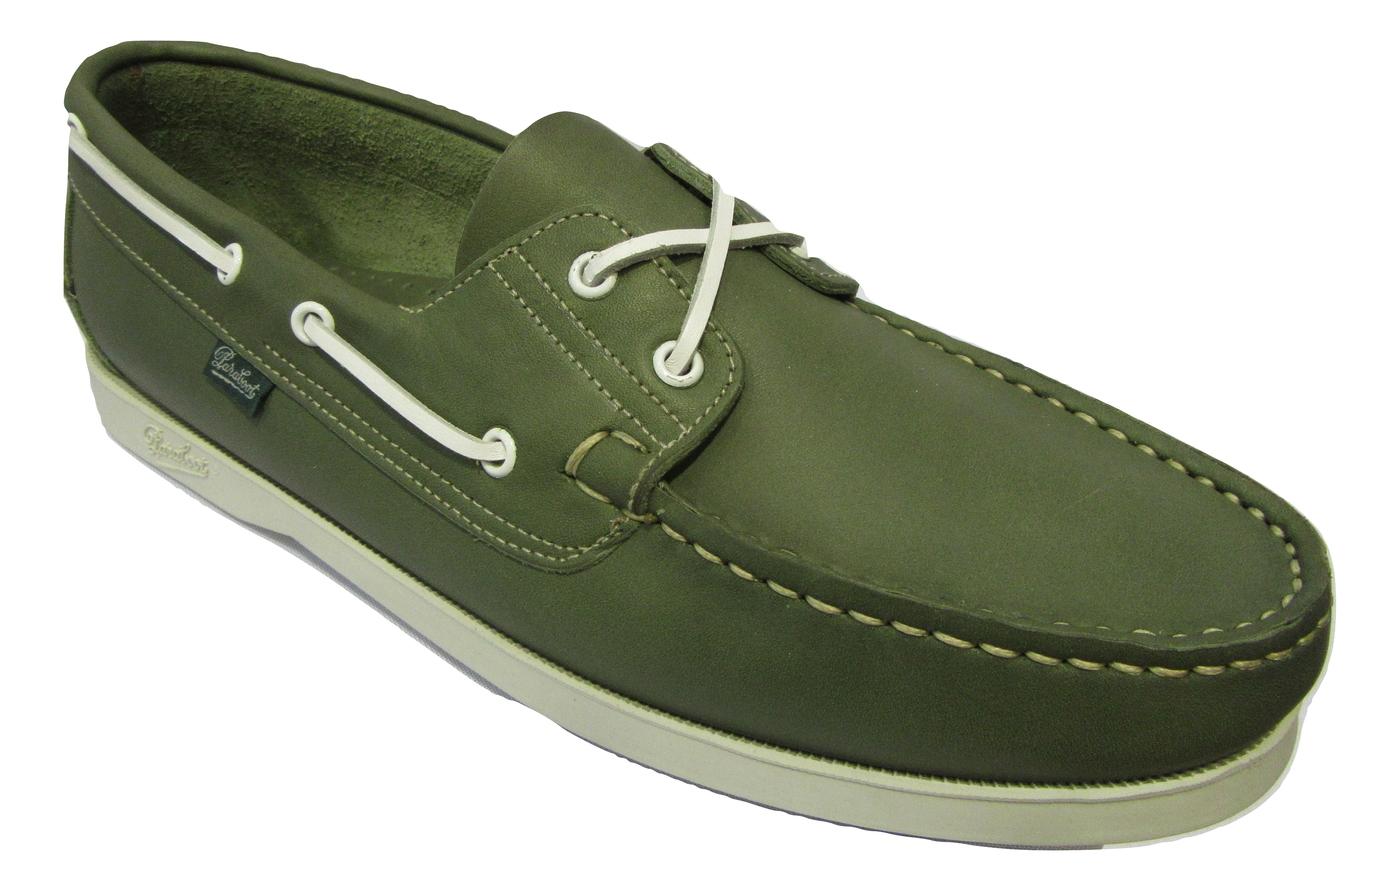 Chaussure bateau PARABOOT cuir vert cousu